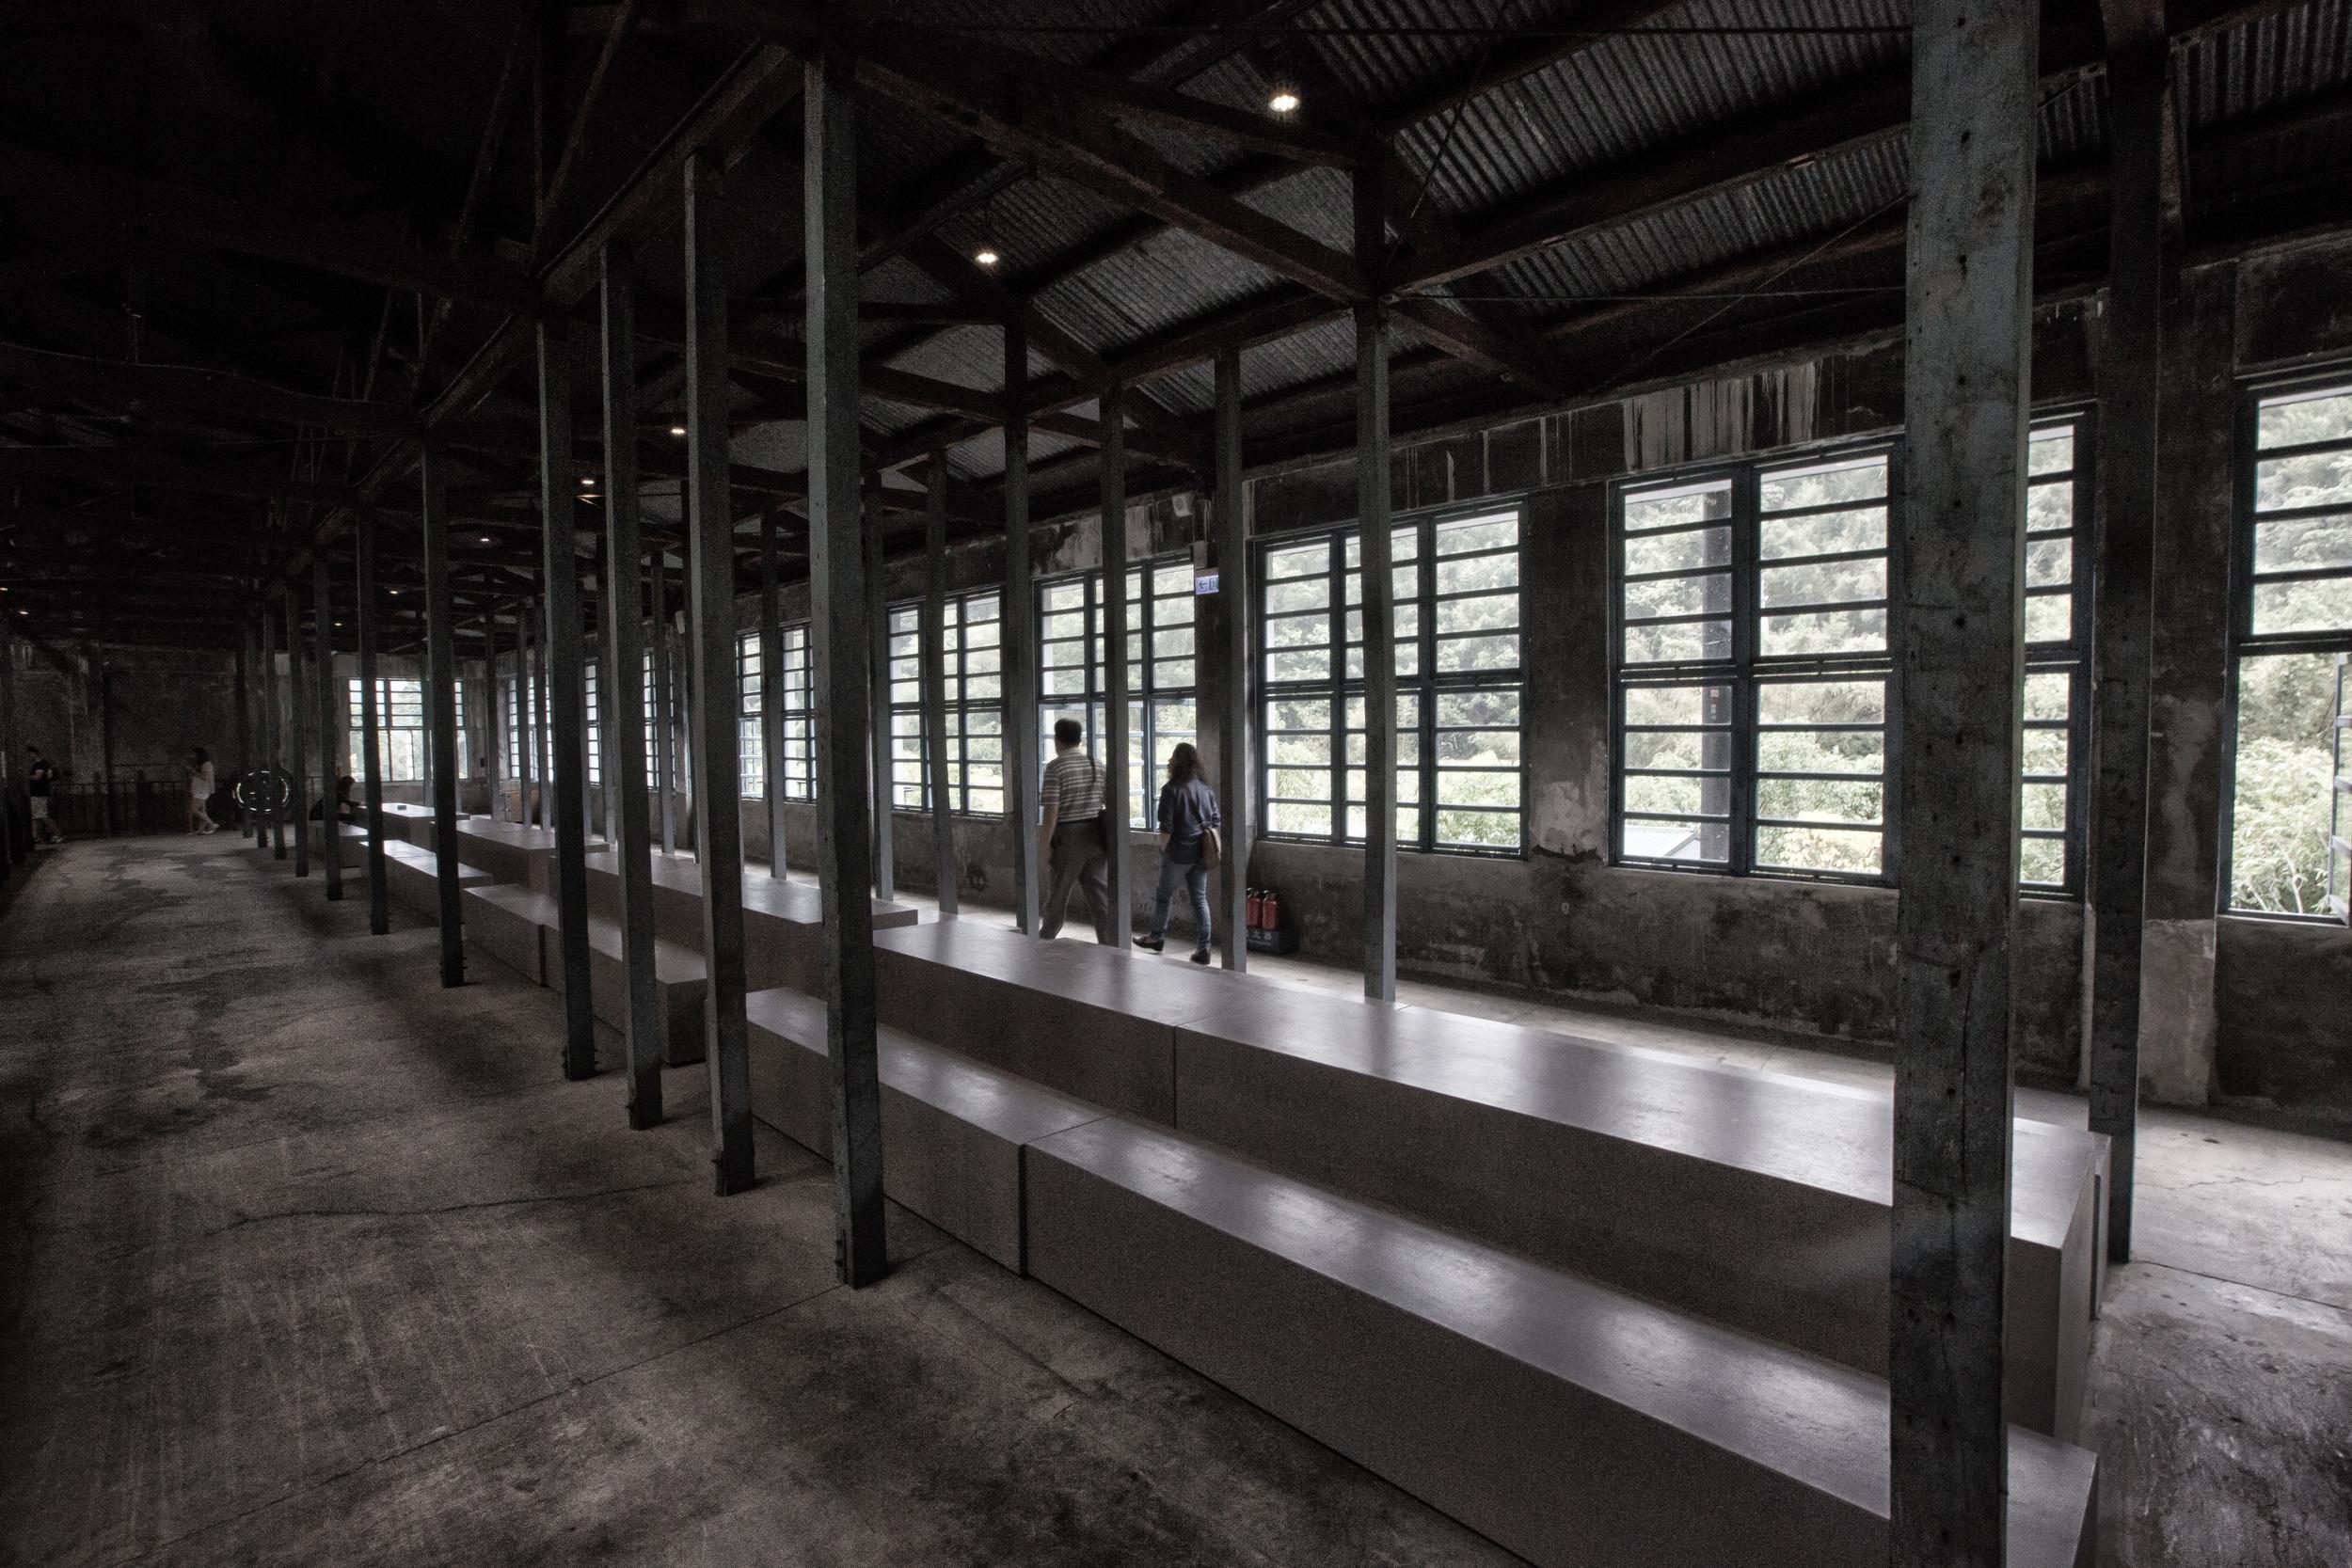 Walking through the warehouse